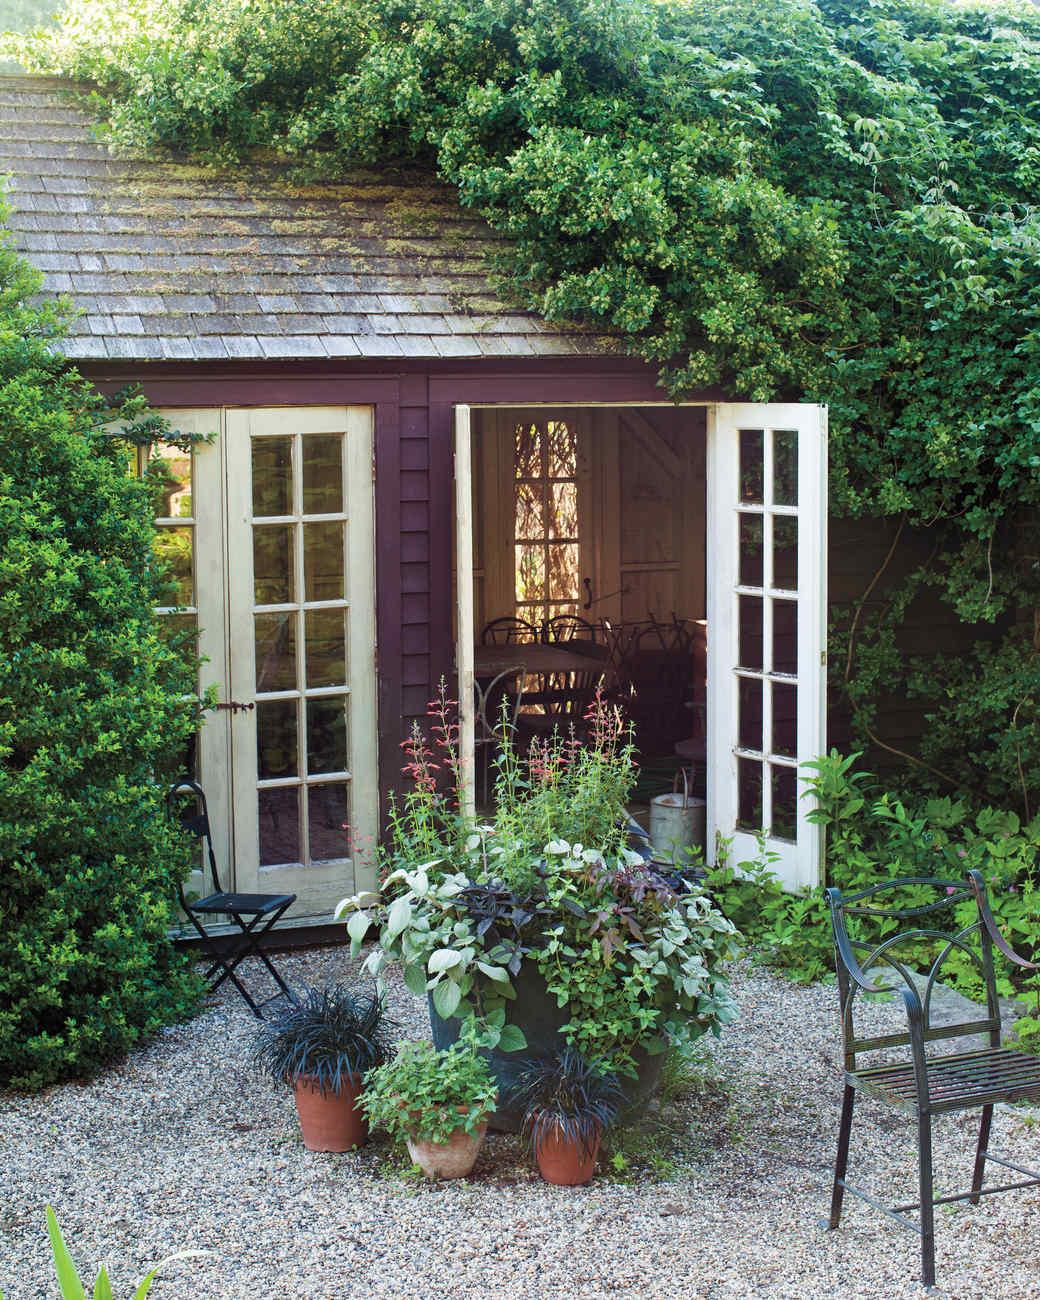 french-doors-hollister-house-7894-edit-md109020.jpg